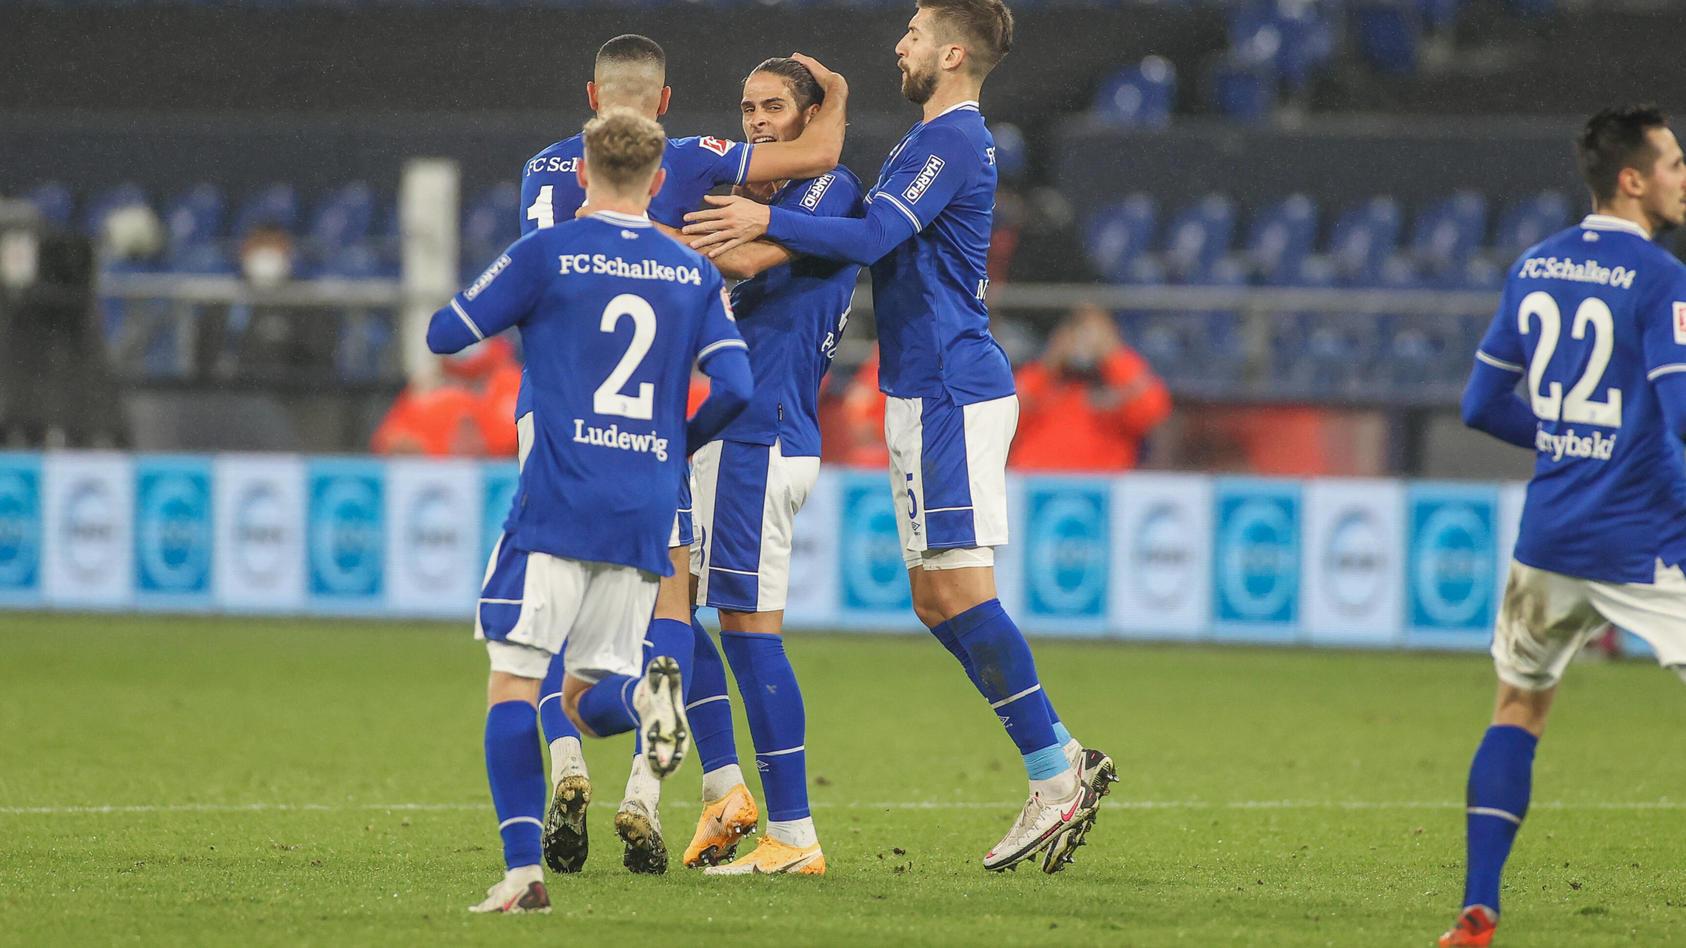 FC Schalke 04 - Union Berlin 18.10.2020, Fussball, Saison 2020/2021, 1. Bundesliga, 4. Spieltag, FC Schalke 04 - Union